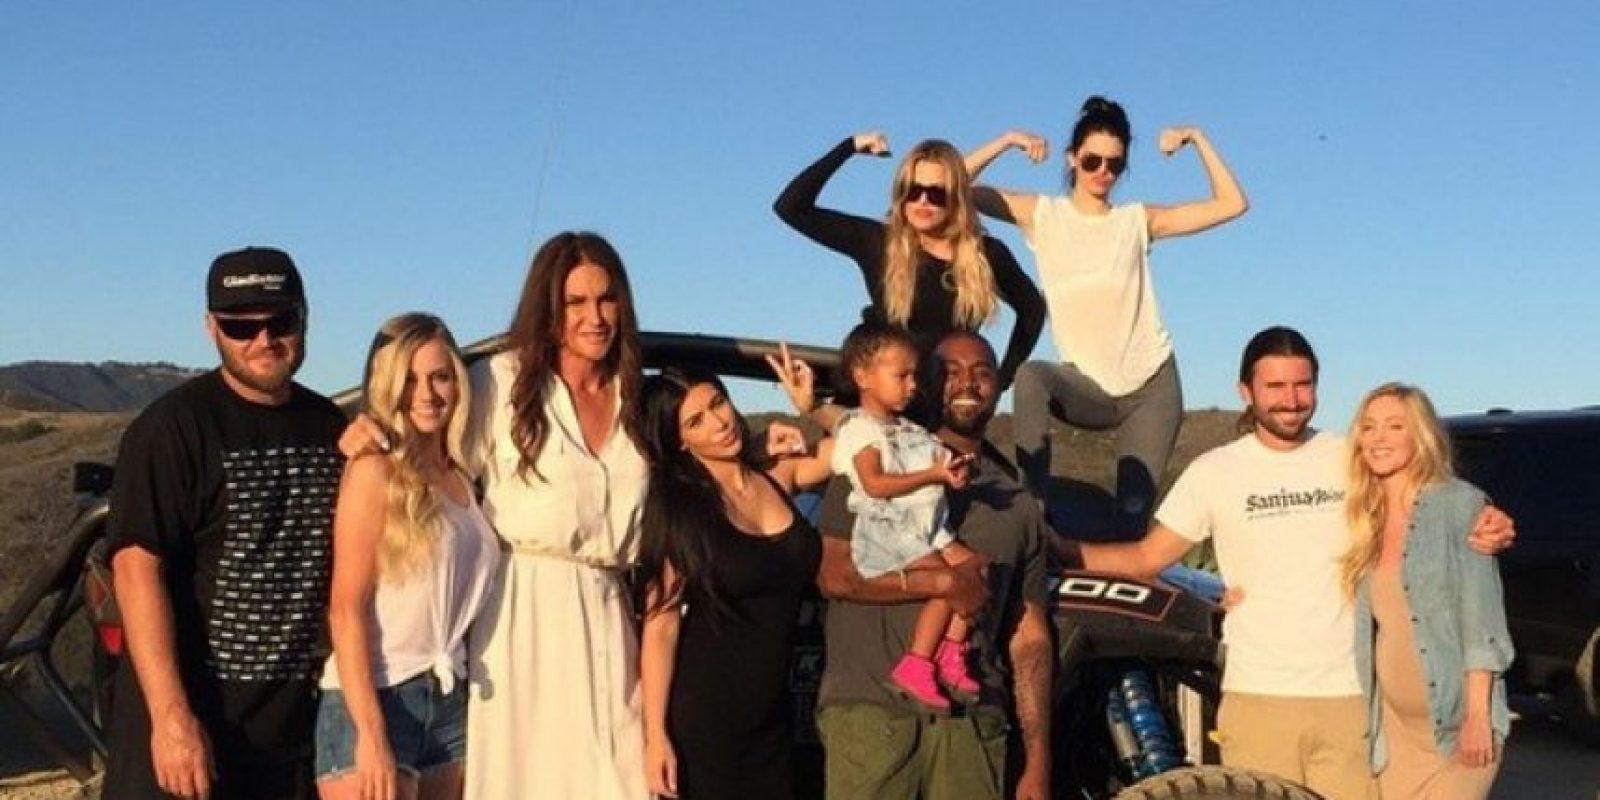 La familia Kardashian – Jenner vivió difíciles momentos durante la transición de Caitlyn. Foto:Instagram/CaitlynJenner